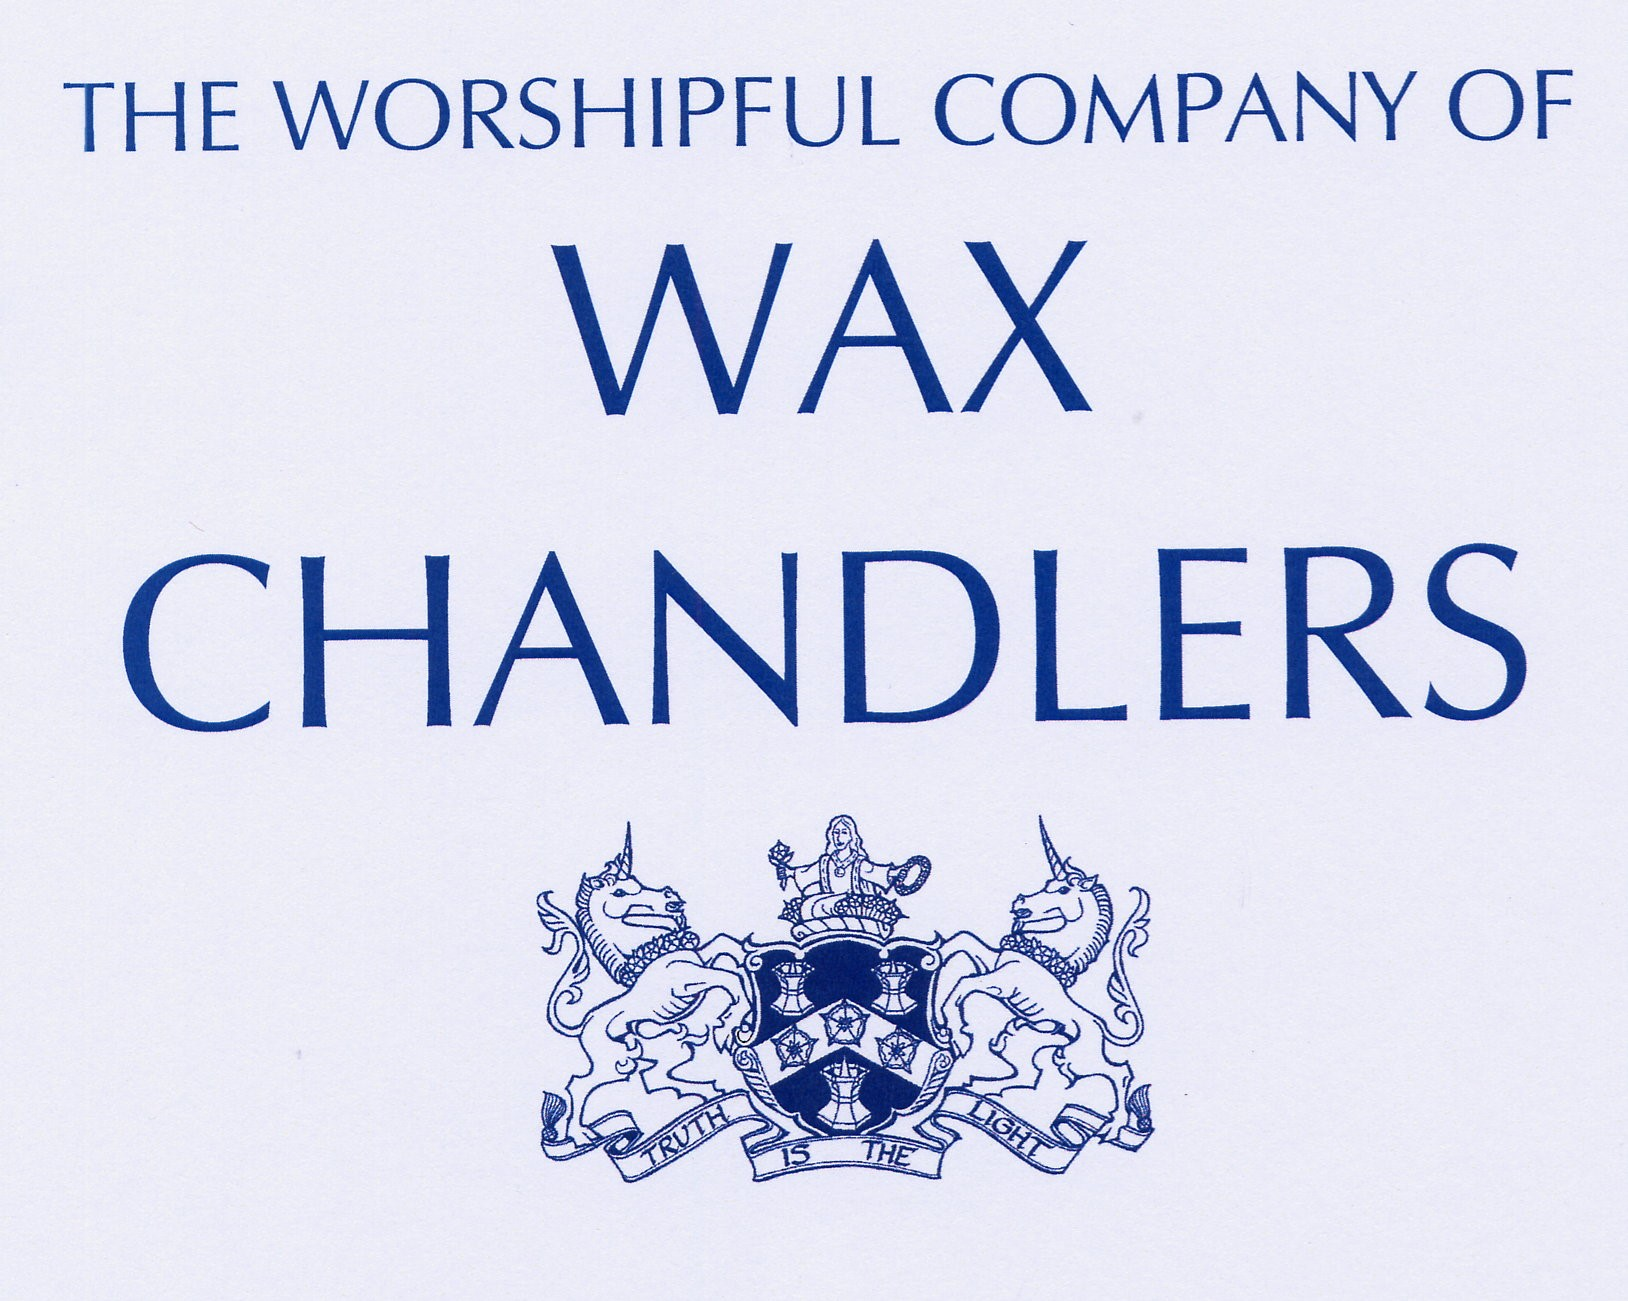 http://www.waxchandlers.org.uk/